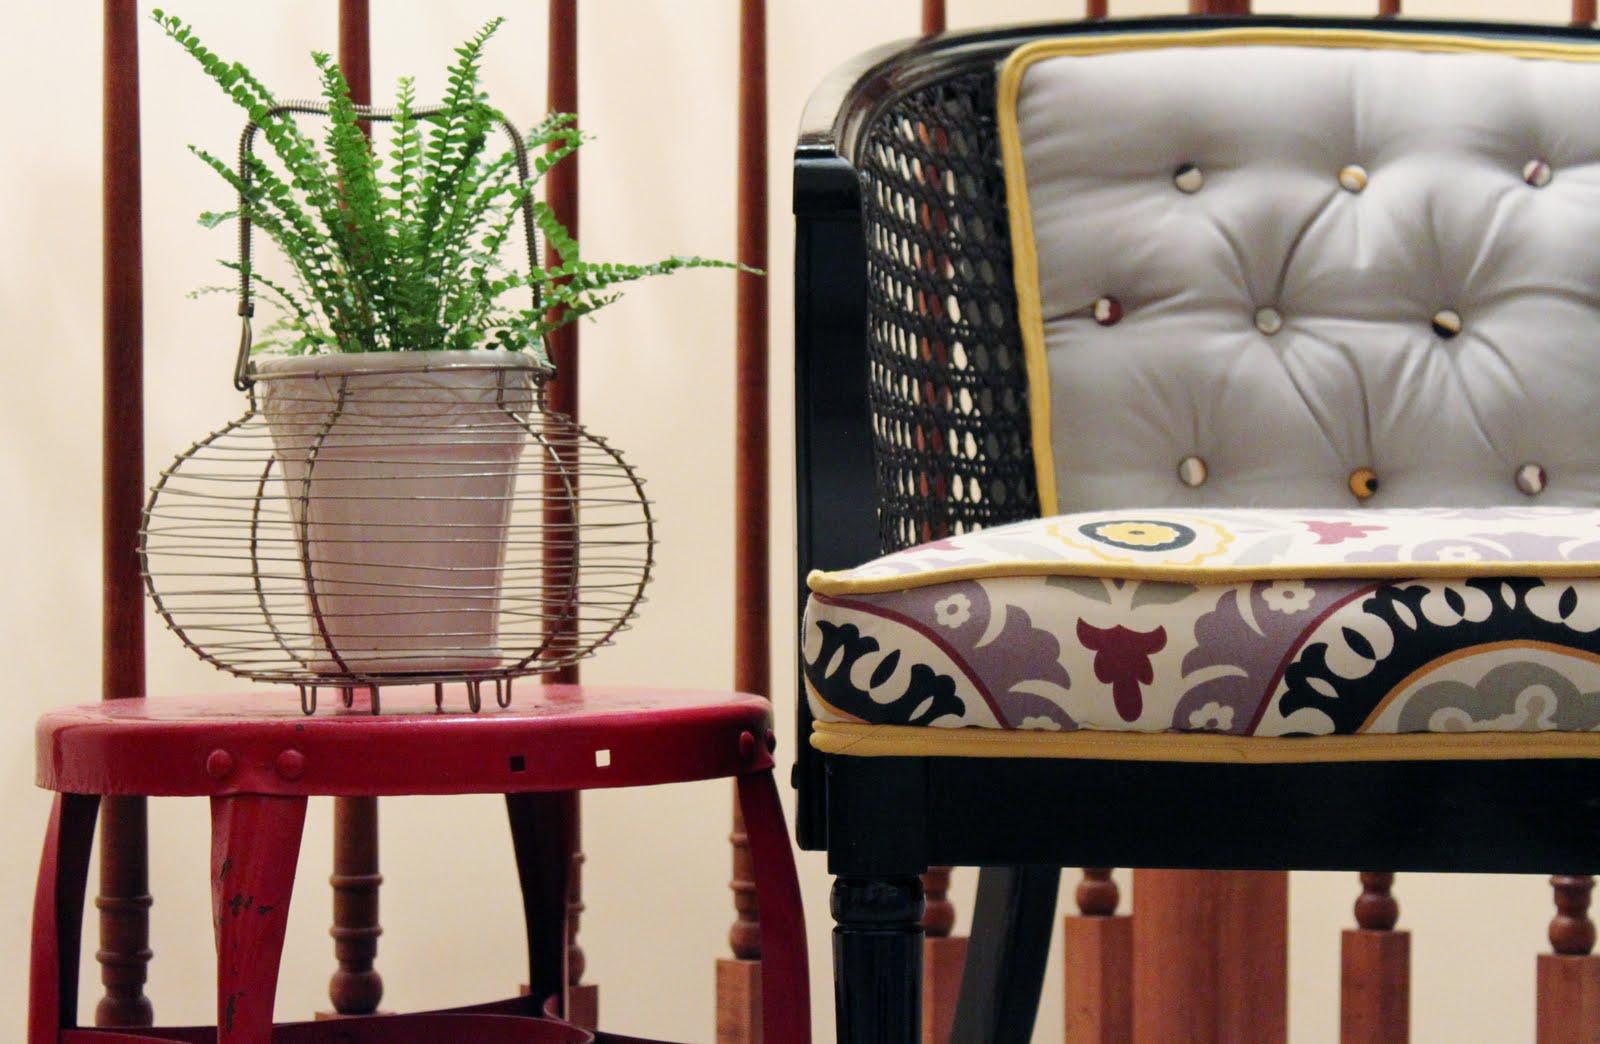 Diy chair upholstery - Diy Chair Upholstery 47